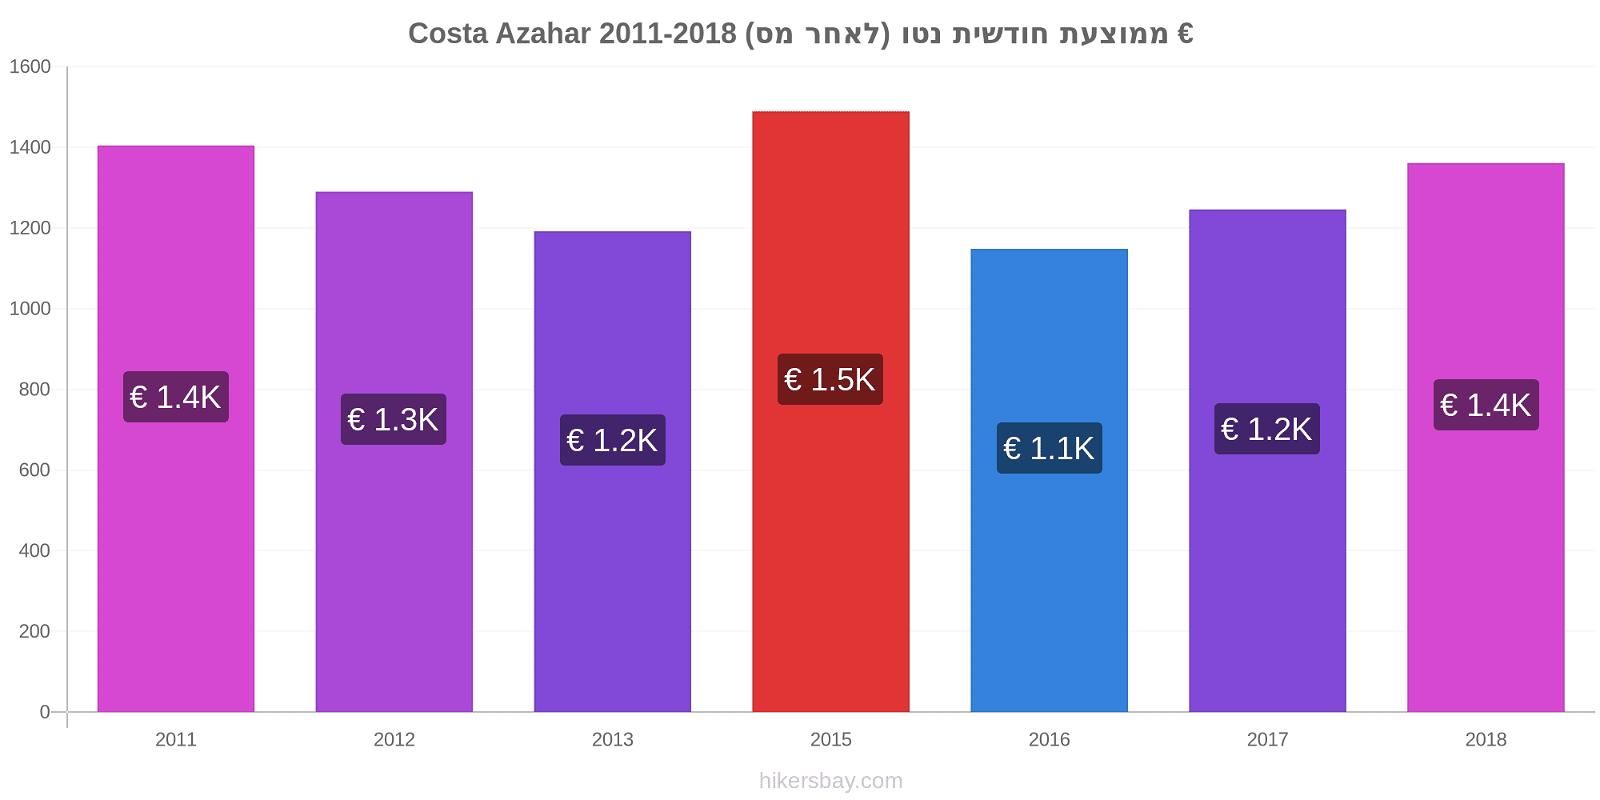 Costa Azahar שינויי מחירים ממוצעת חודשית נטו (לאחר מס) hikersbay.com